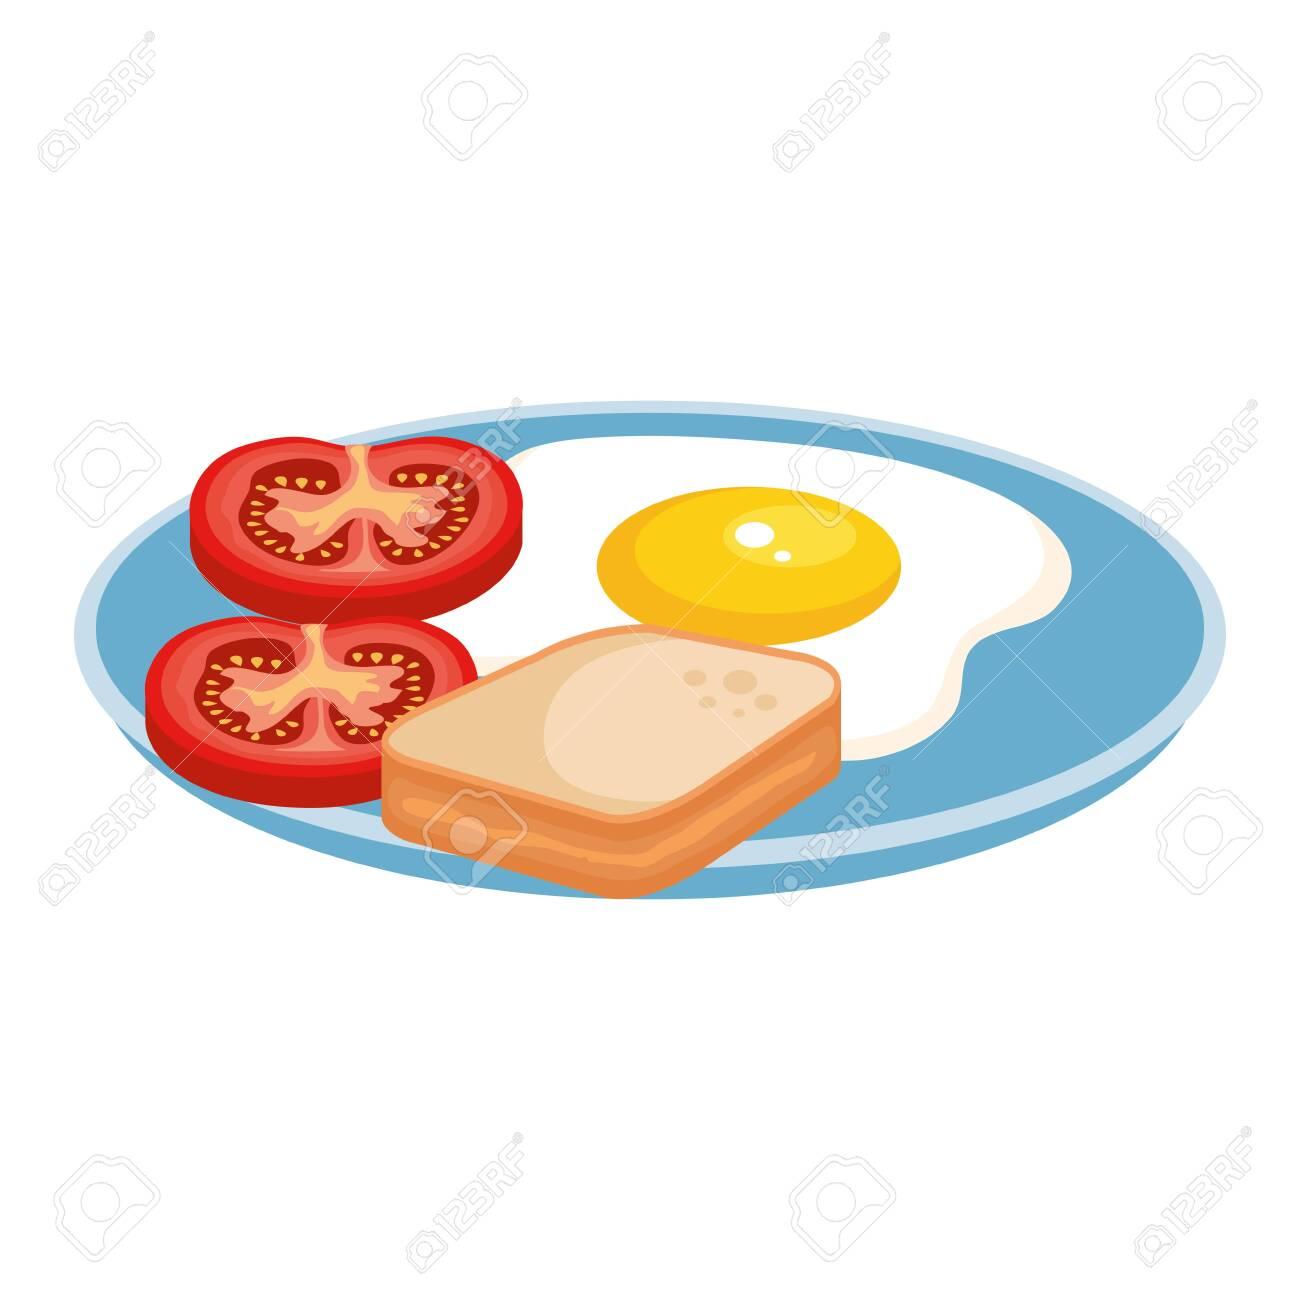 delicious breakfast menu icons vector illustration design - 124175325